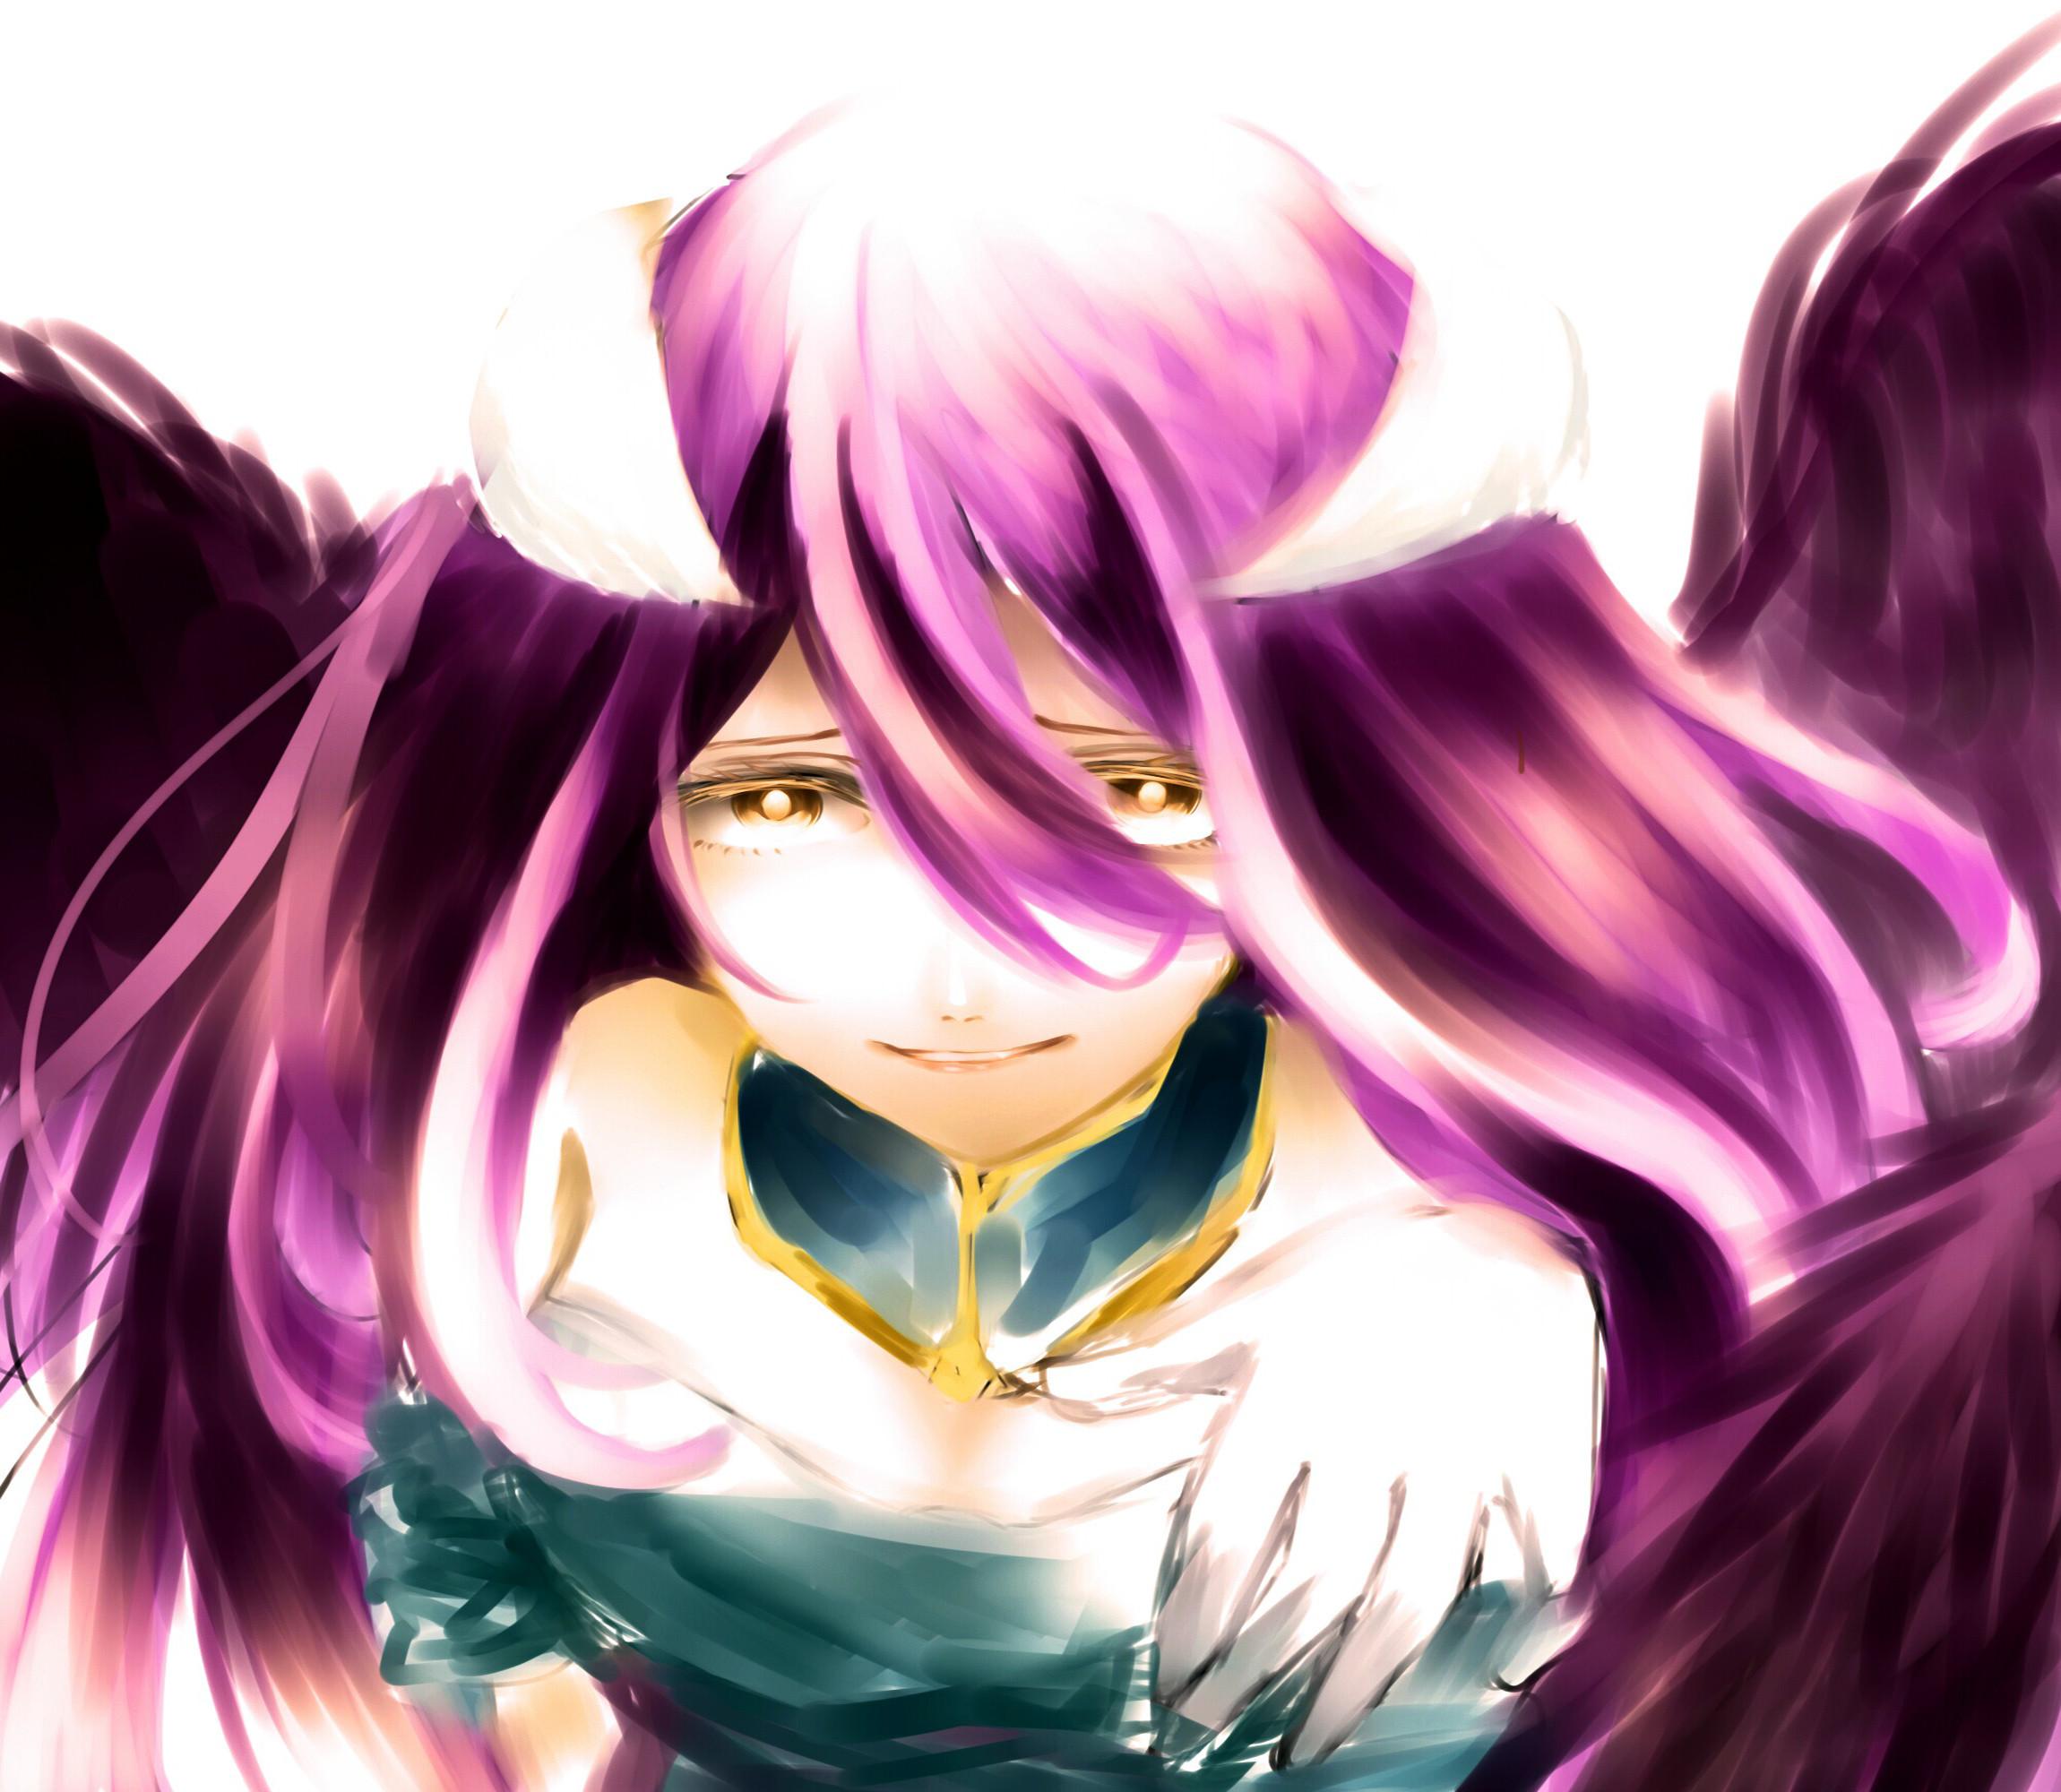 Anime Overlord Overlord Albedo Wallpaper. AlbedoDark AnimeBeautifulWallpapersAnime  GirlsPhp